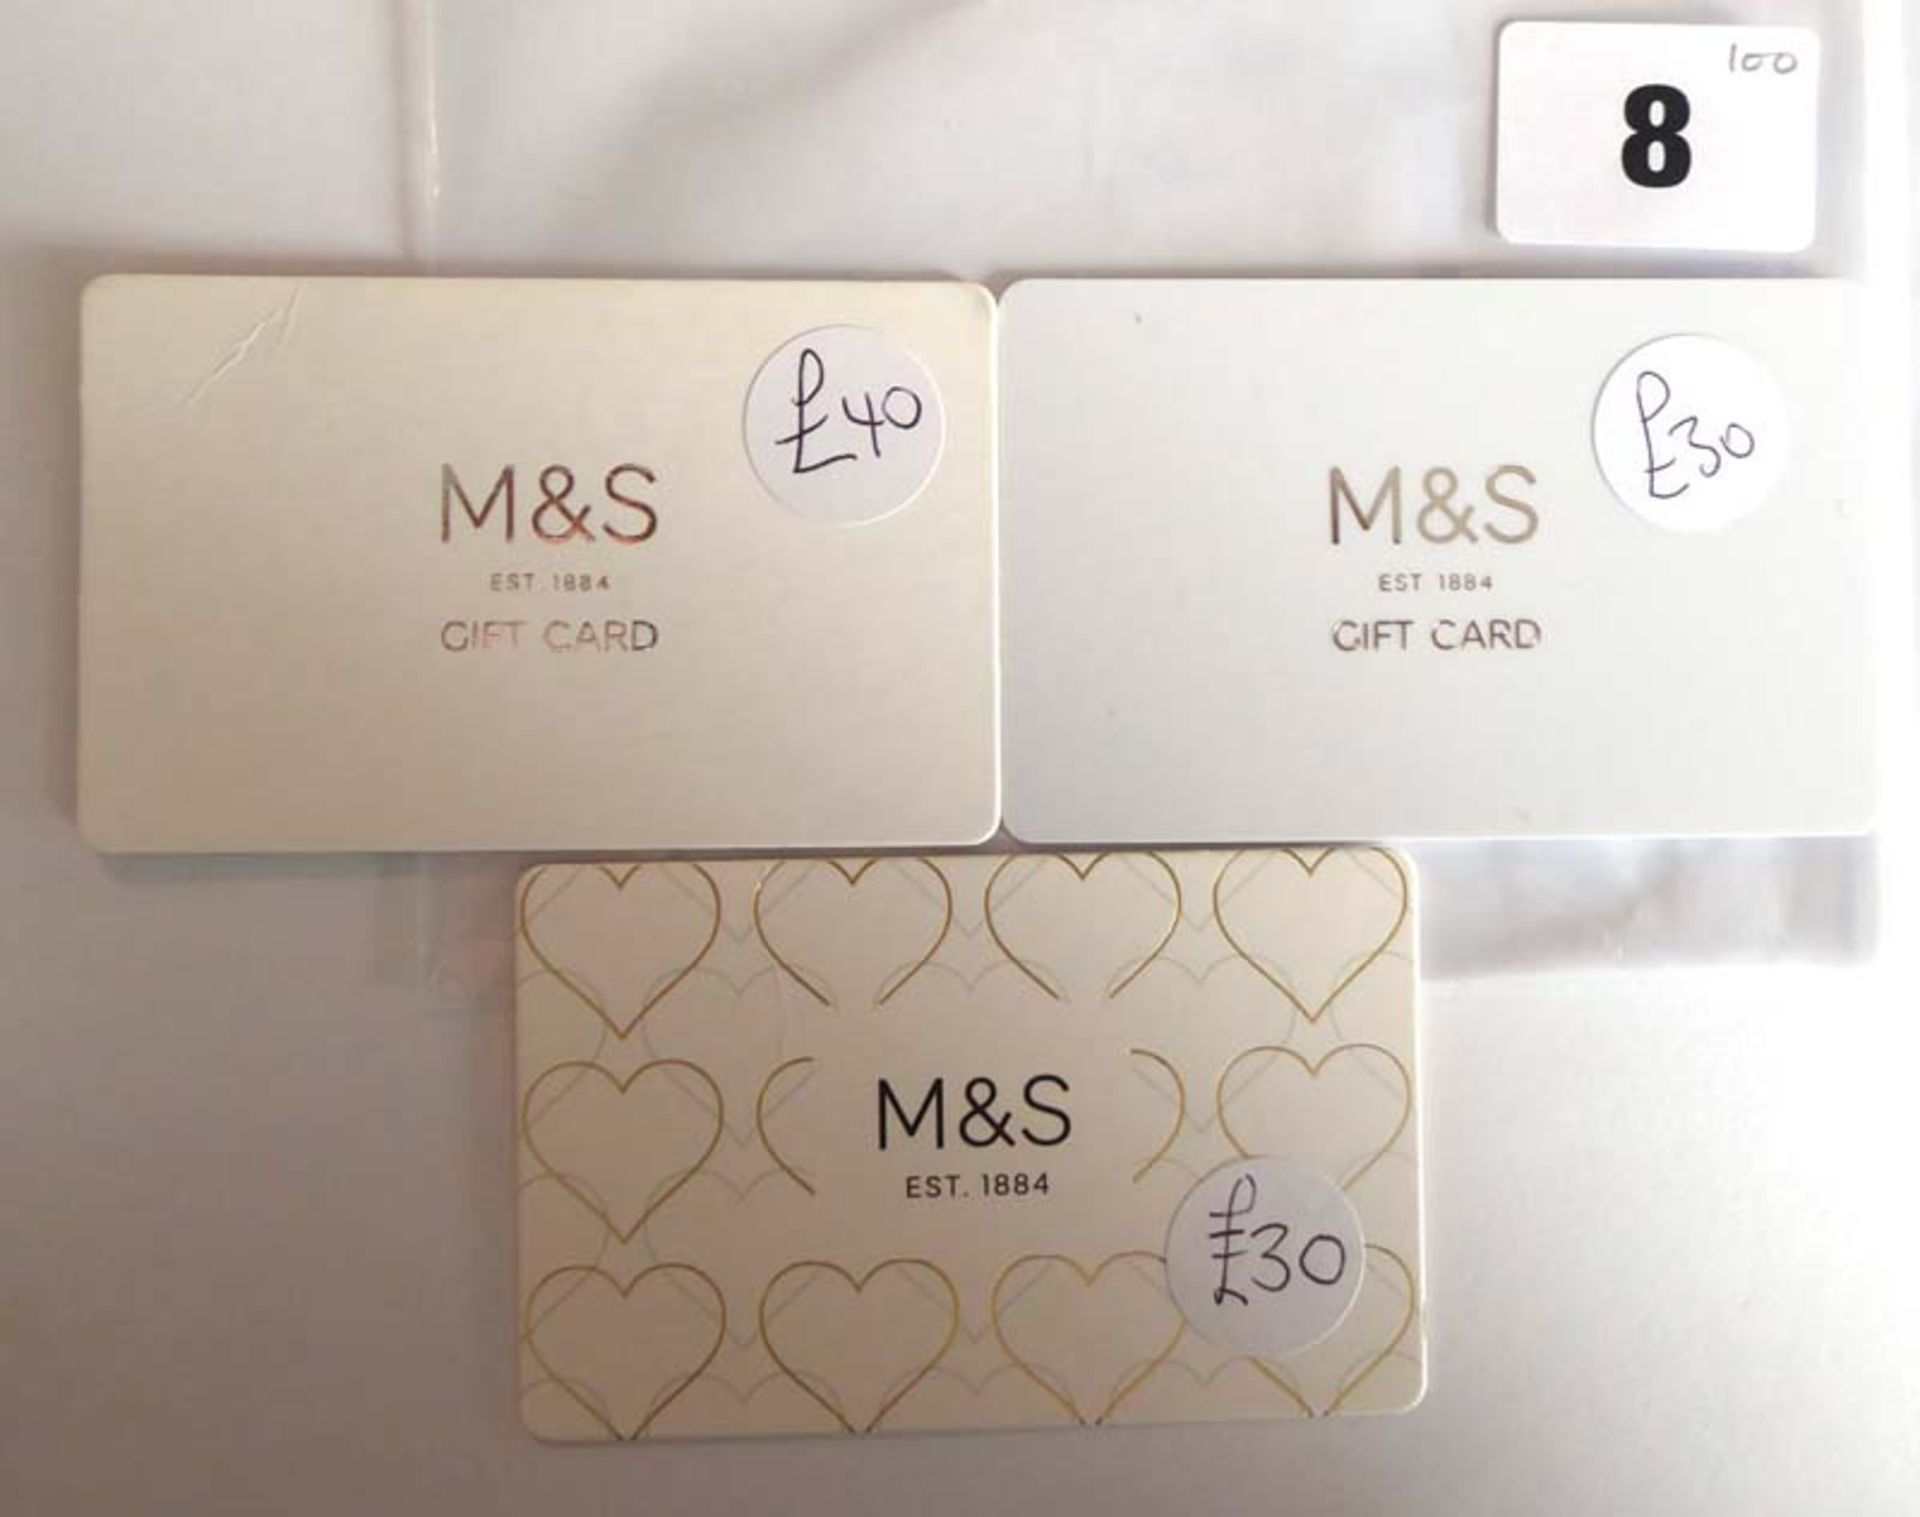 Lot 8 - Marks & Spencer (x3) - Total face value £100